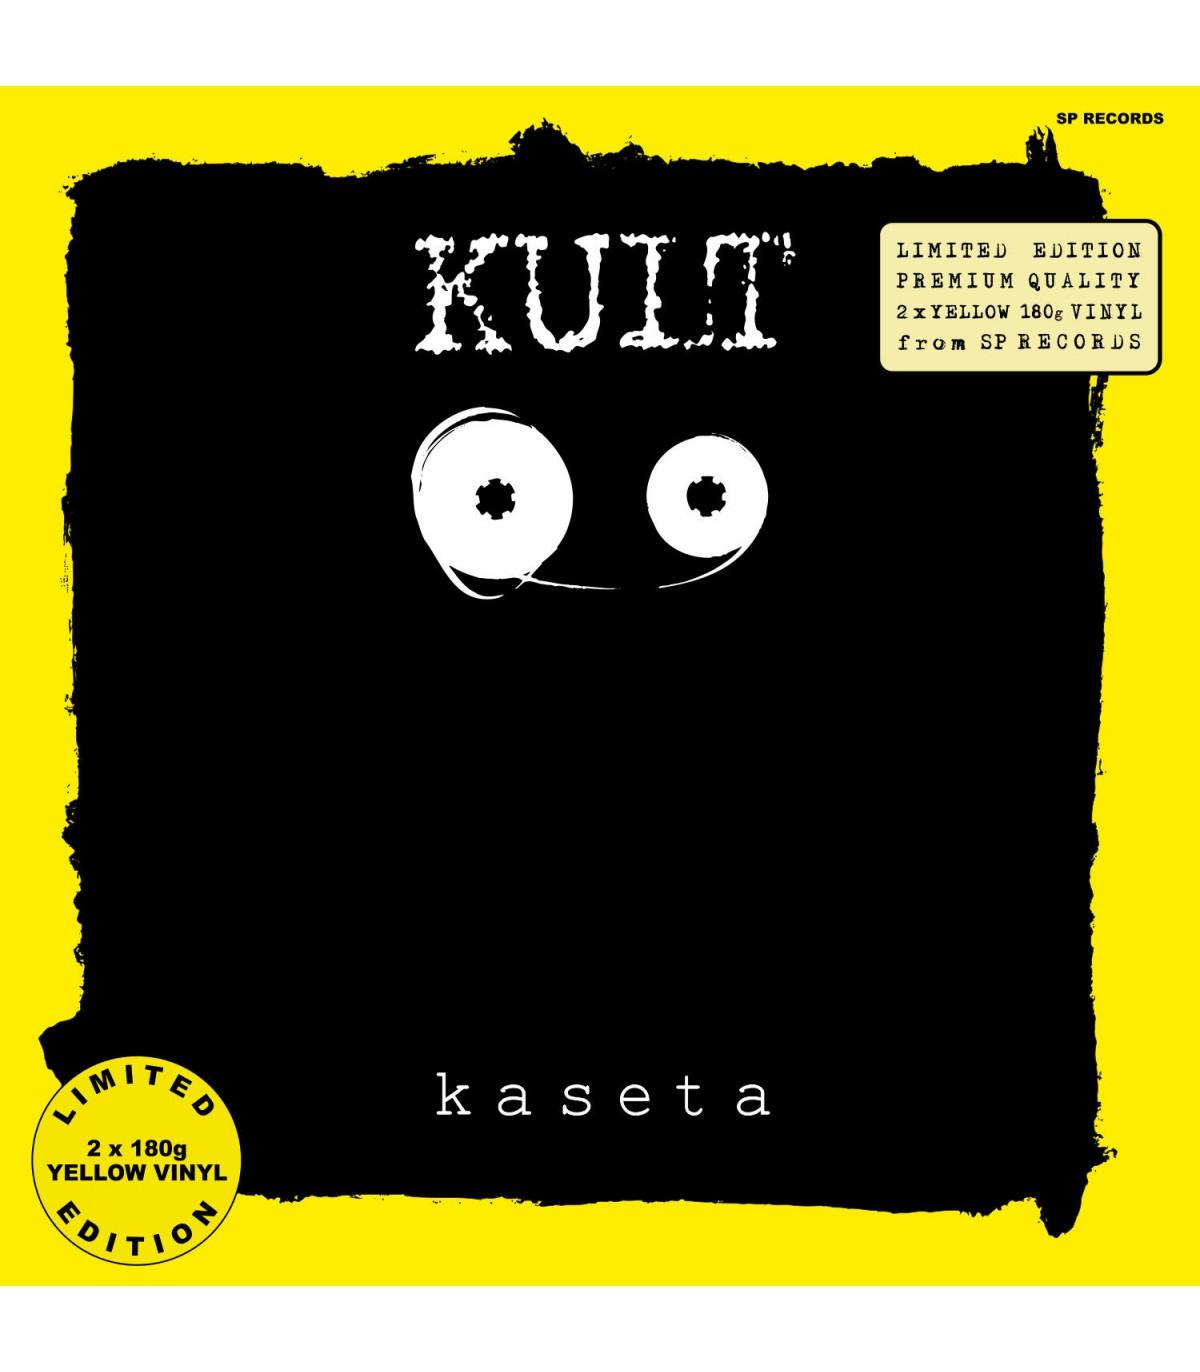 Winyl KULT - KASETA [2LP] LIMITED EDITION YELLOW VINYL 2 x 180 g (PREORDER DO DNIA : 05.03.2021) od SP RECORDS